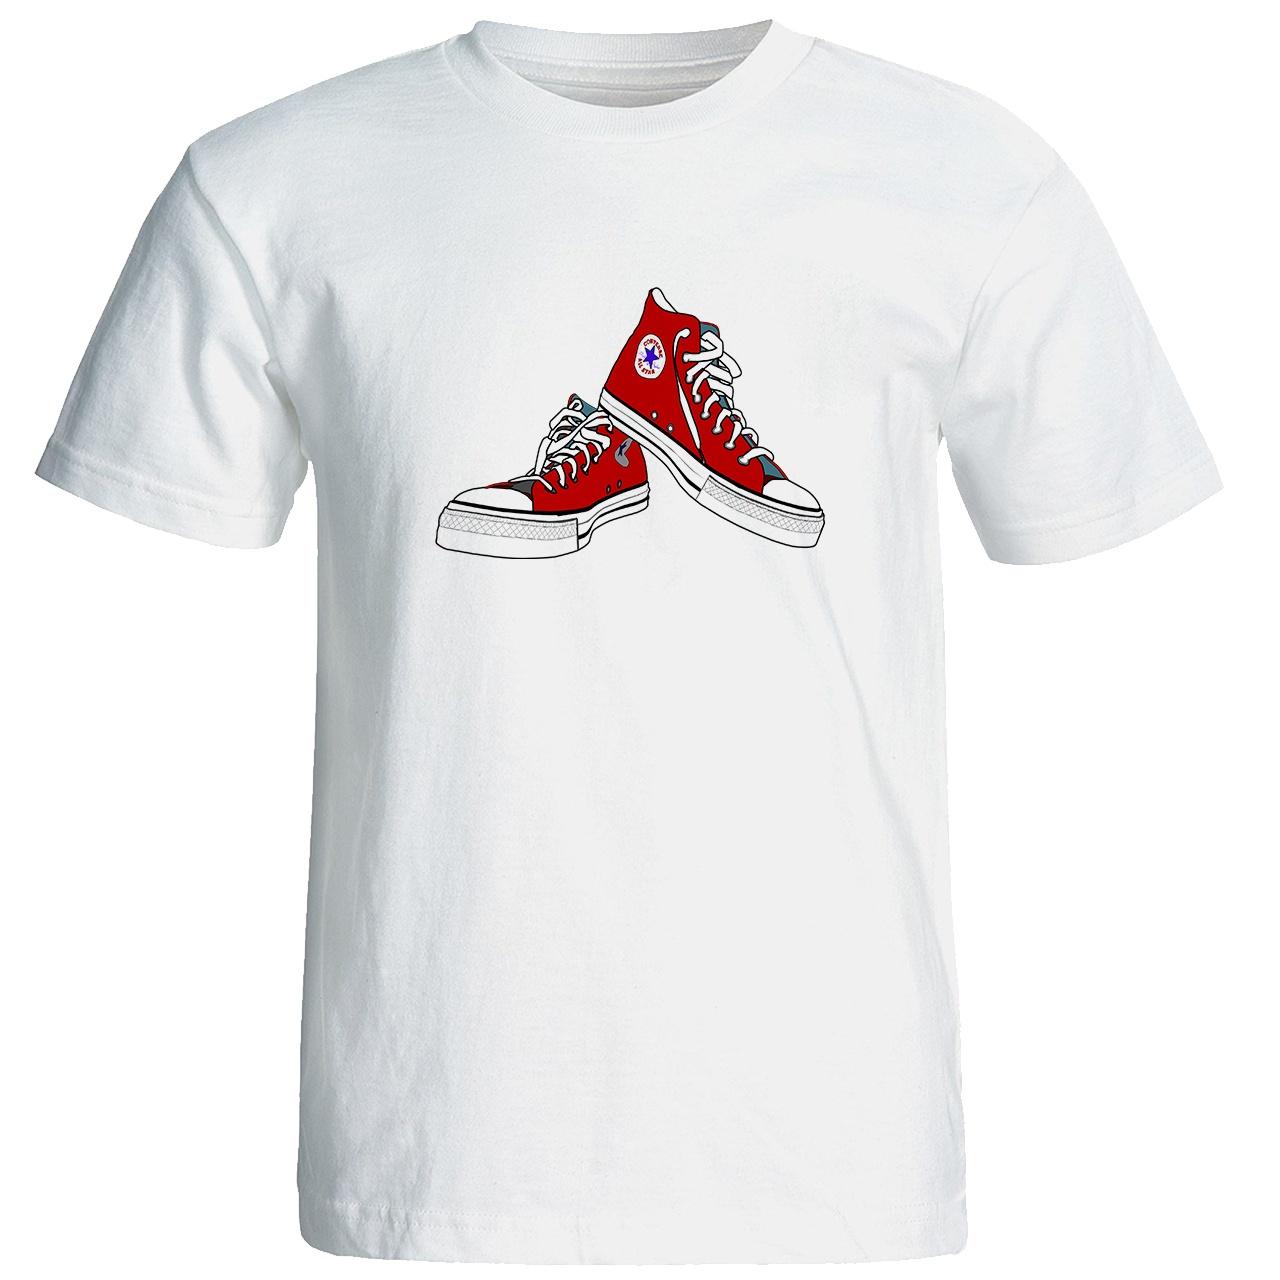 Photo of تی شرت آستین کوتاه مردانه طرح کفش کد ۸۰۰۸